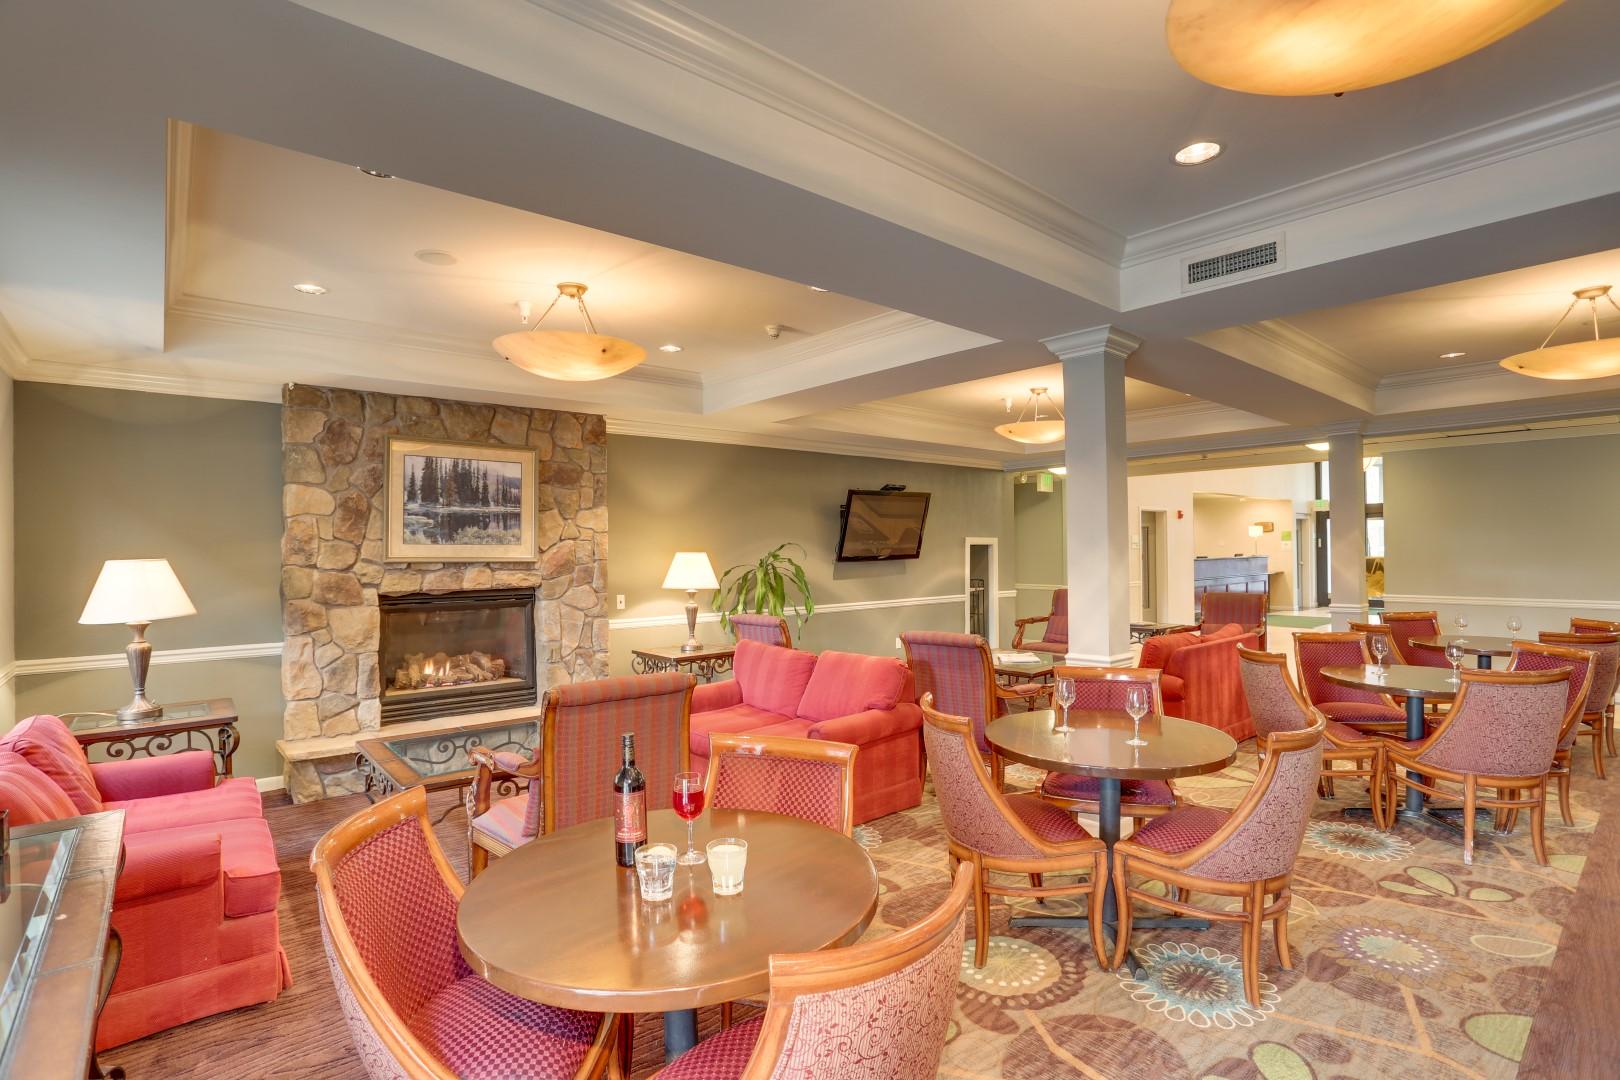 Spokane Hotel Photography - Hotel Lounge